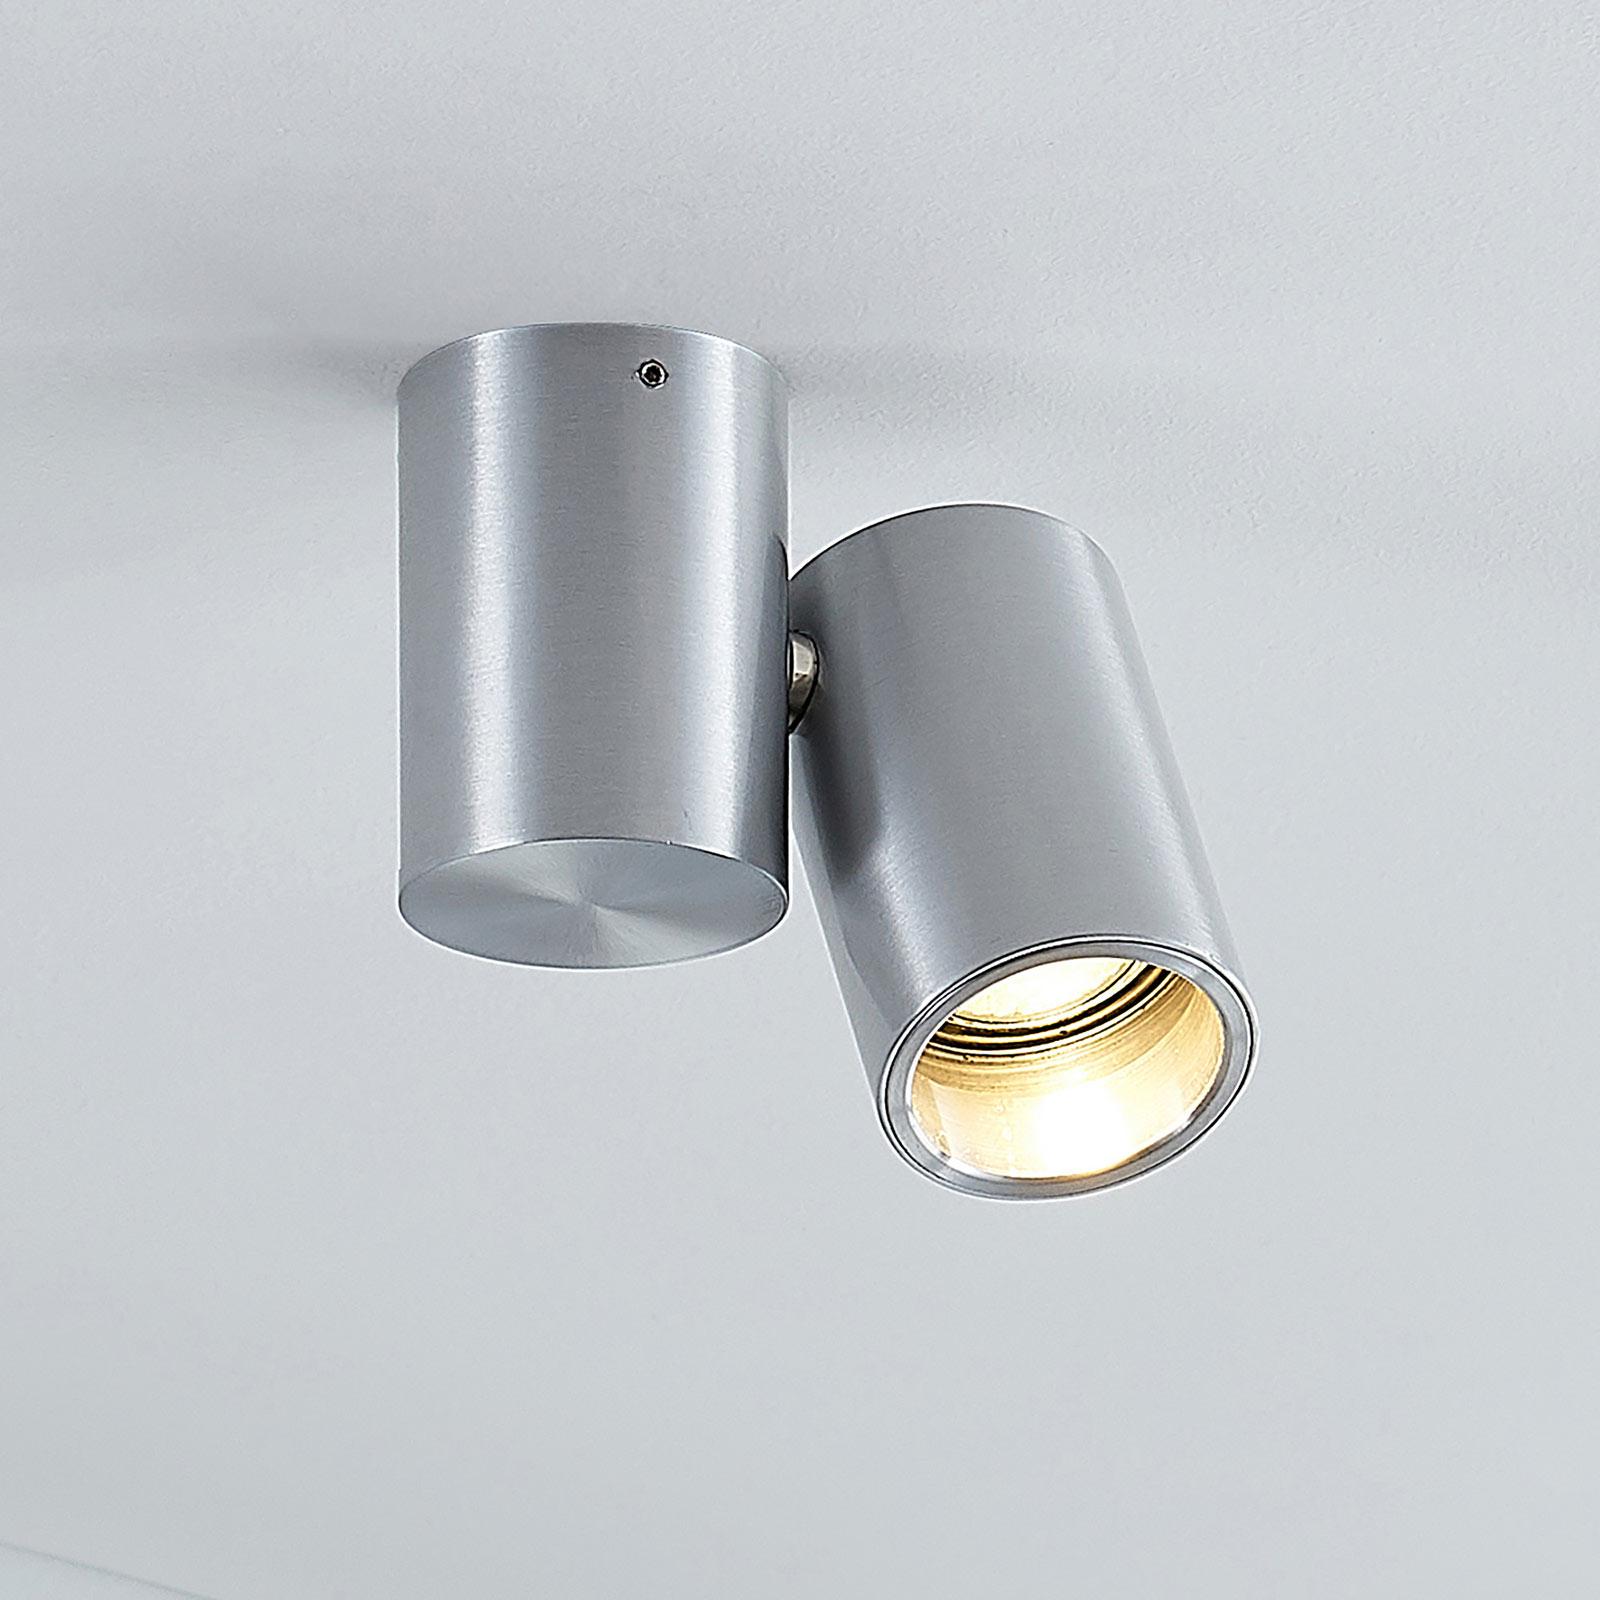 Taklampe Gesina, 1 lyskilde, aluminium